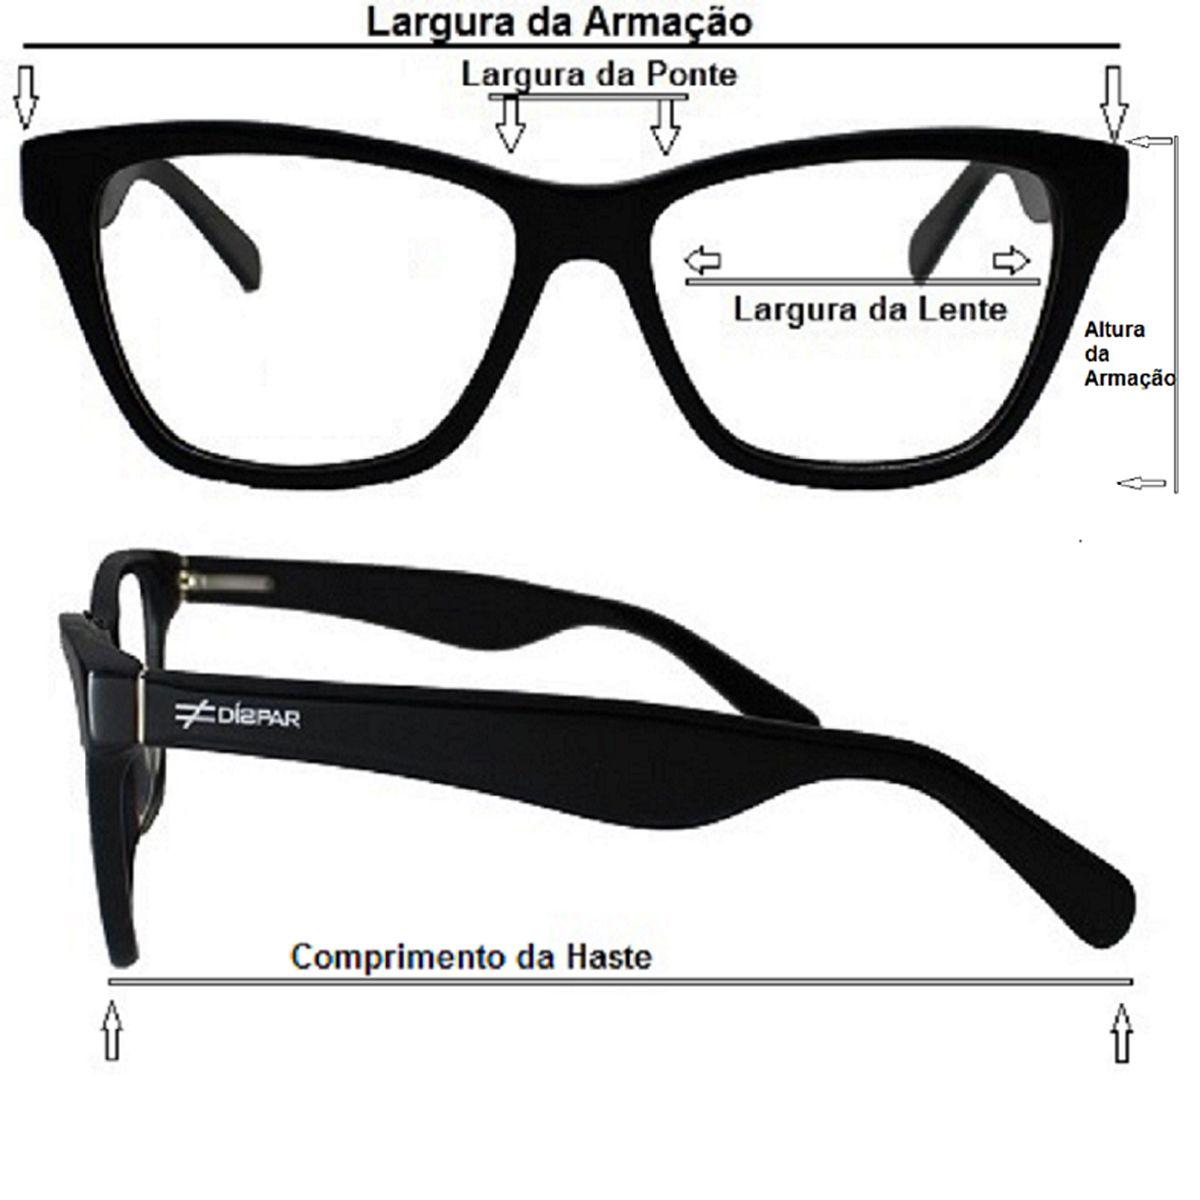 Óculos de Sol Díspar ID1898 infantil idade 6 a 9 anos Azul